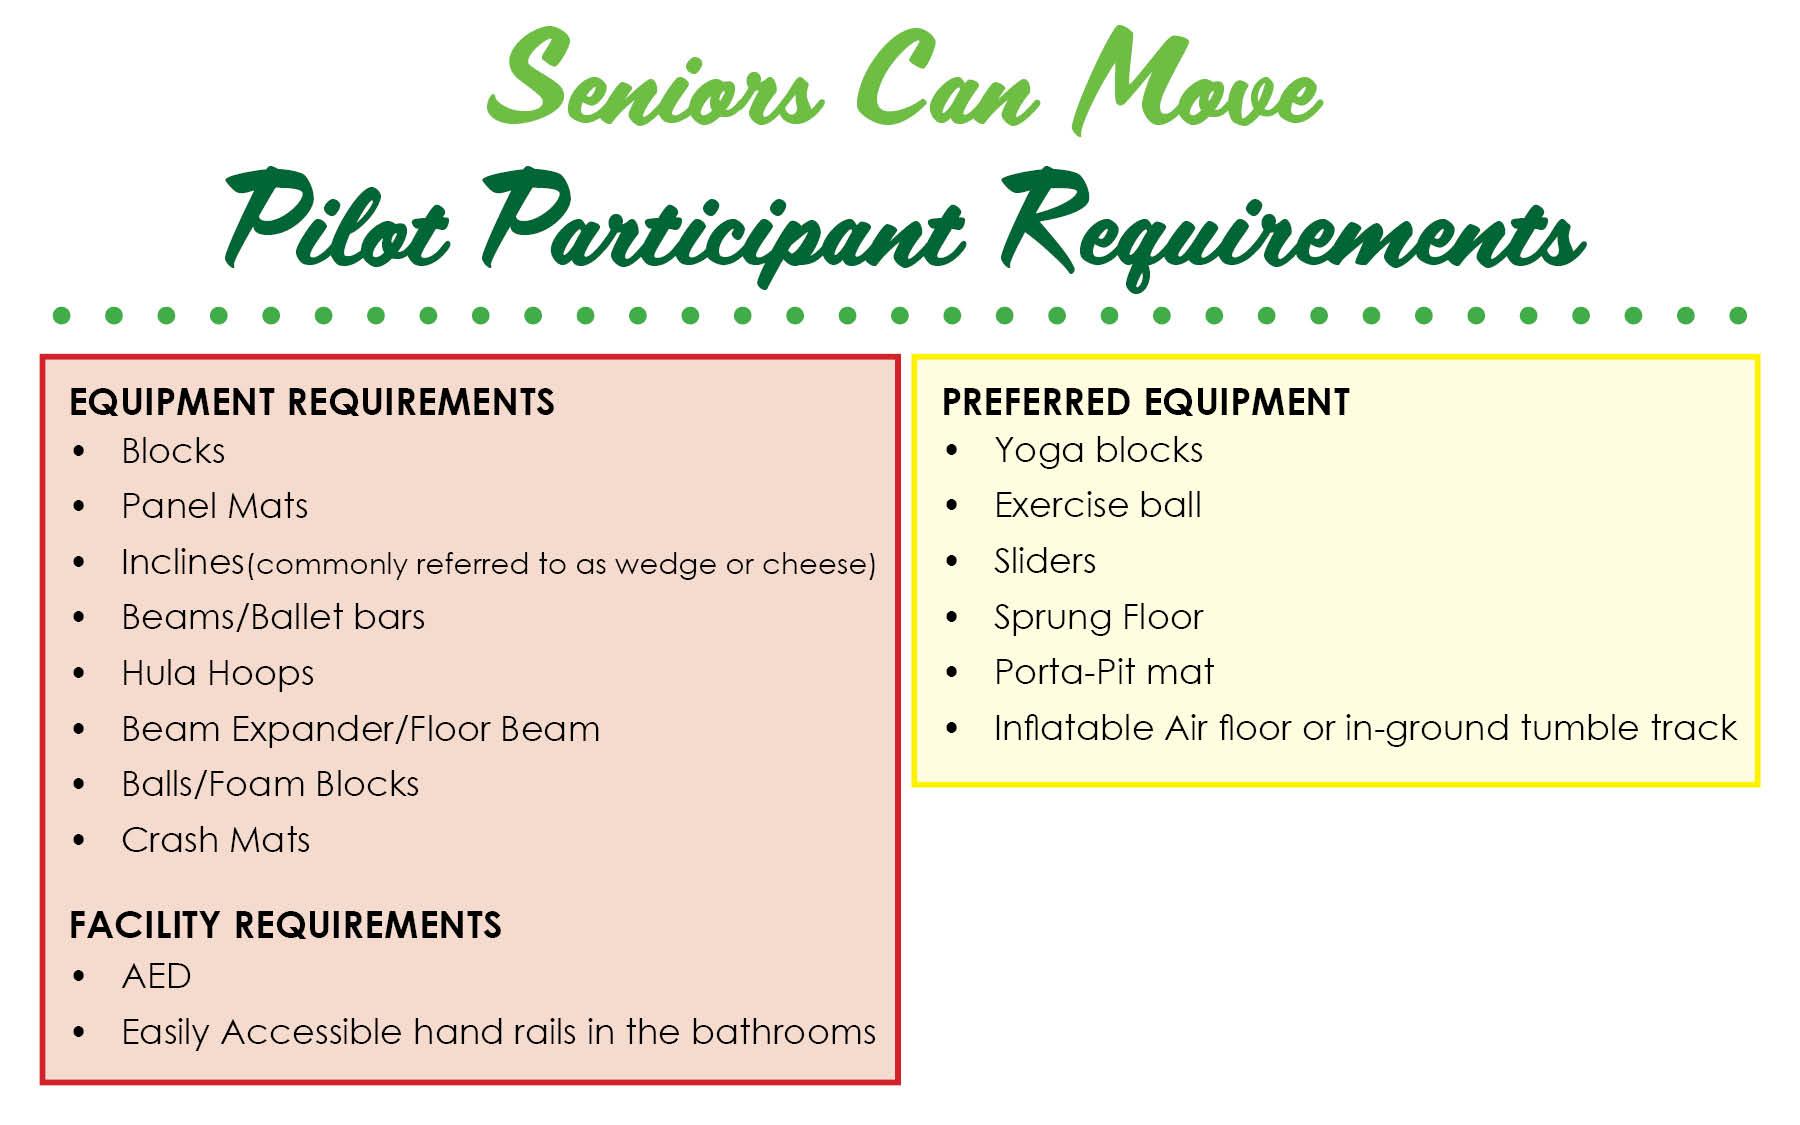 SeniorsCanMove-equipment.jpg